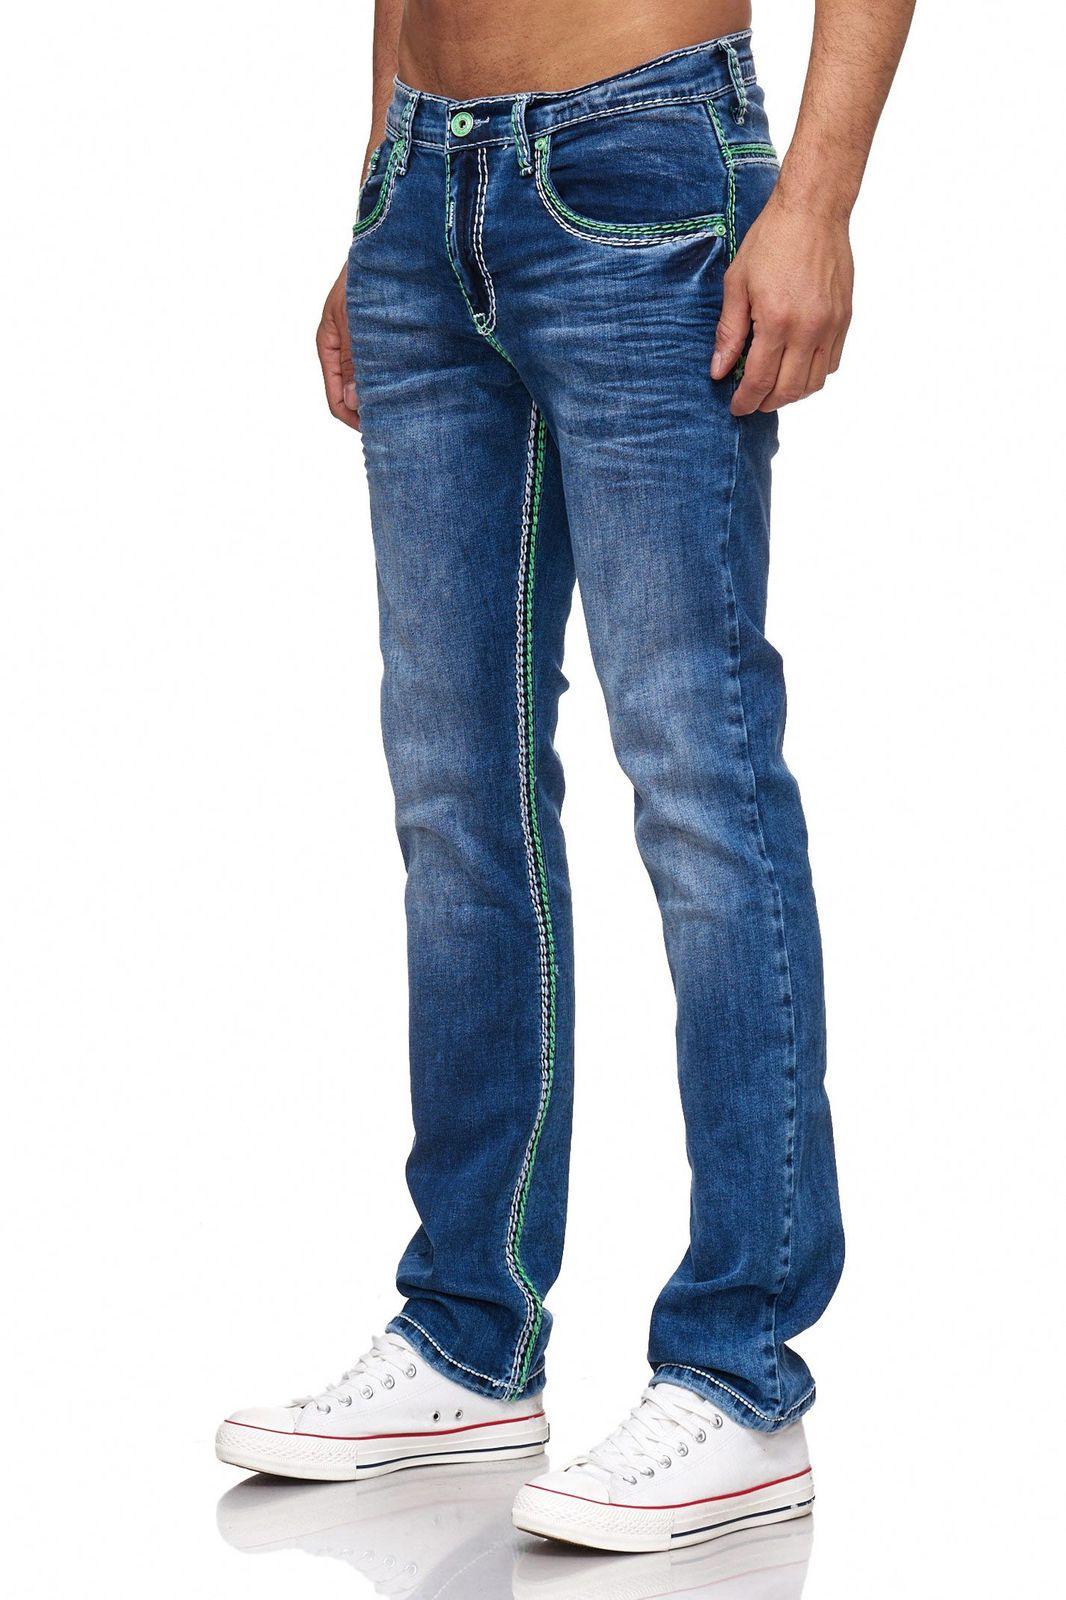 Rusty Neal Herren Jeans Hose 7444-2